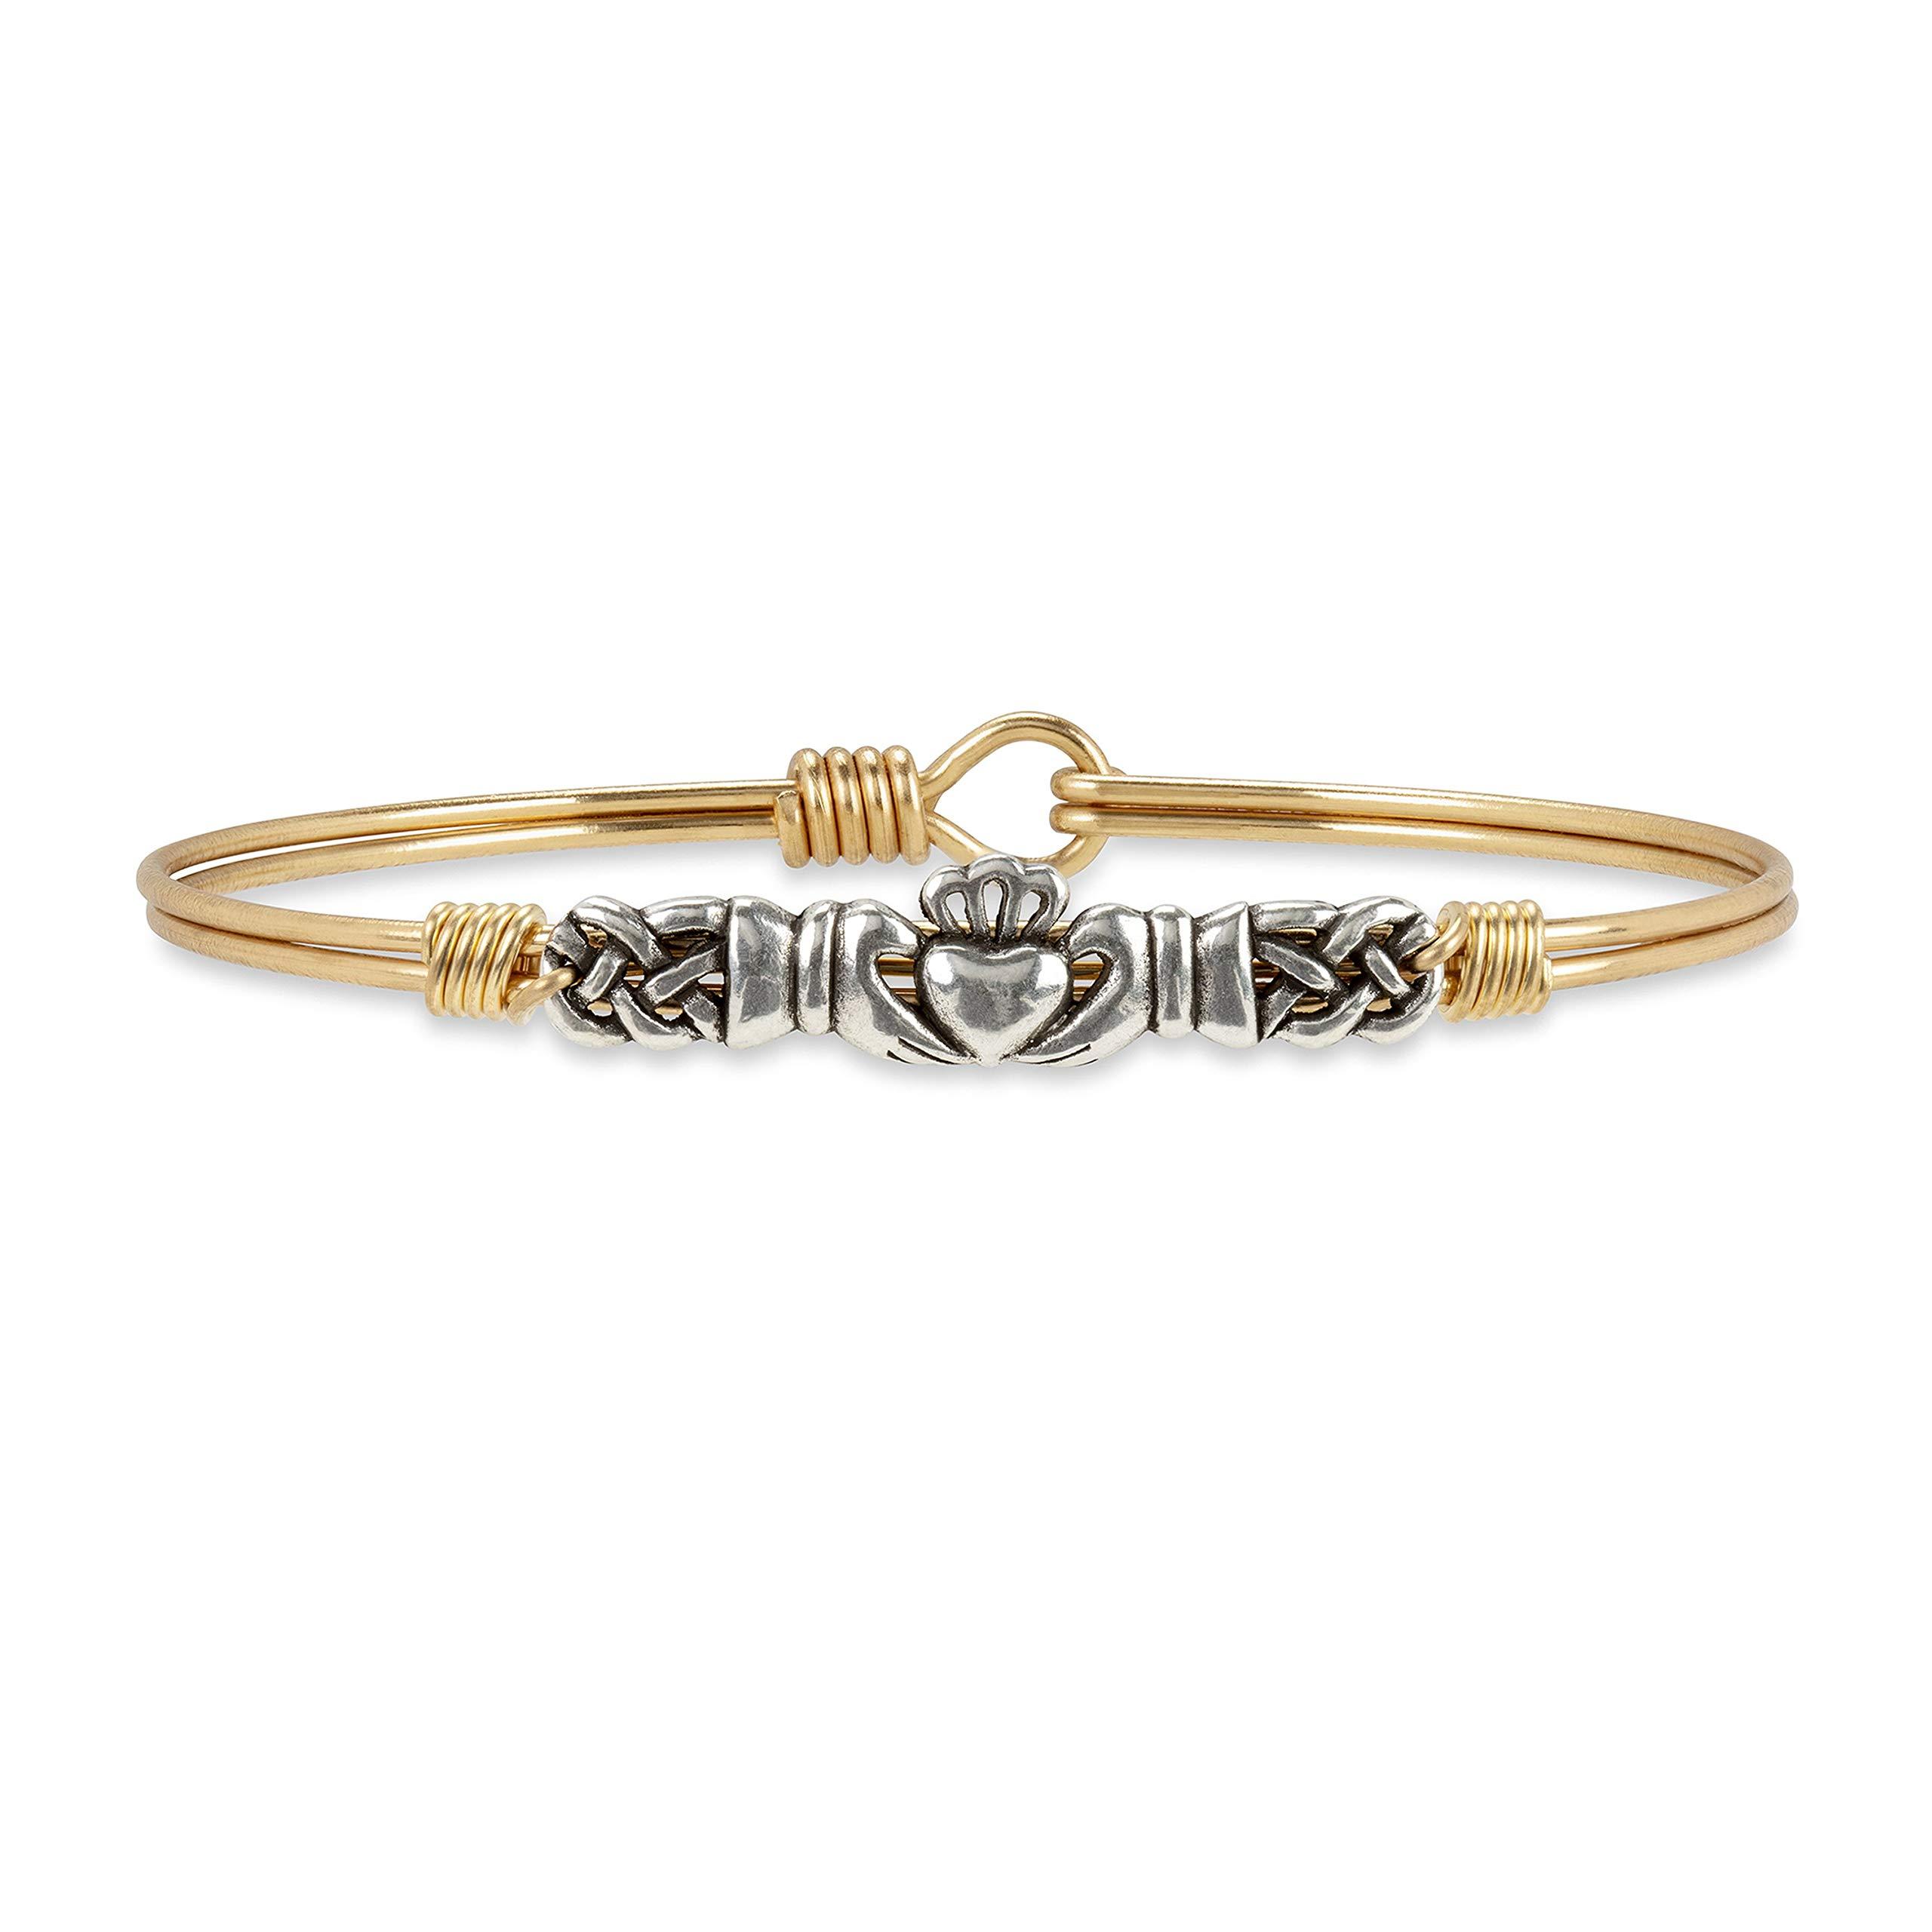 Luca + Danni Claddagh Bangle Bracelet - Regular/Brass Tone